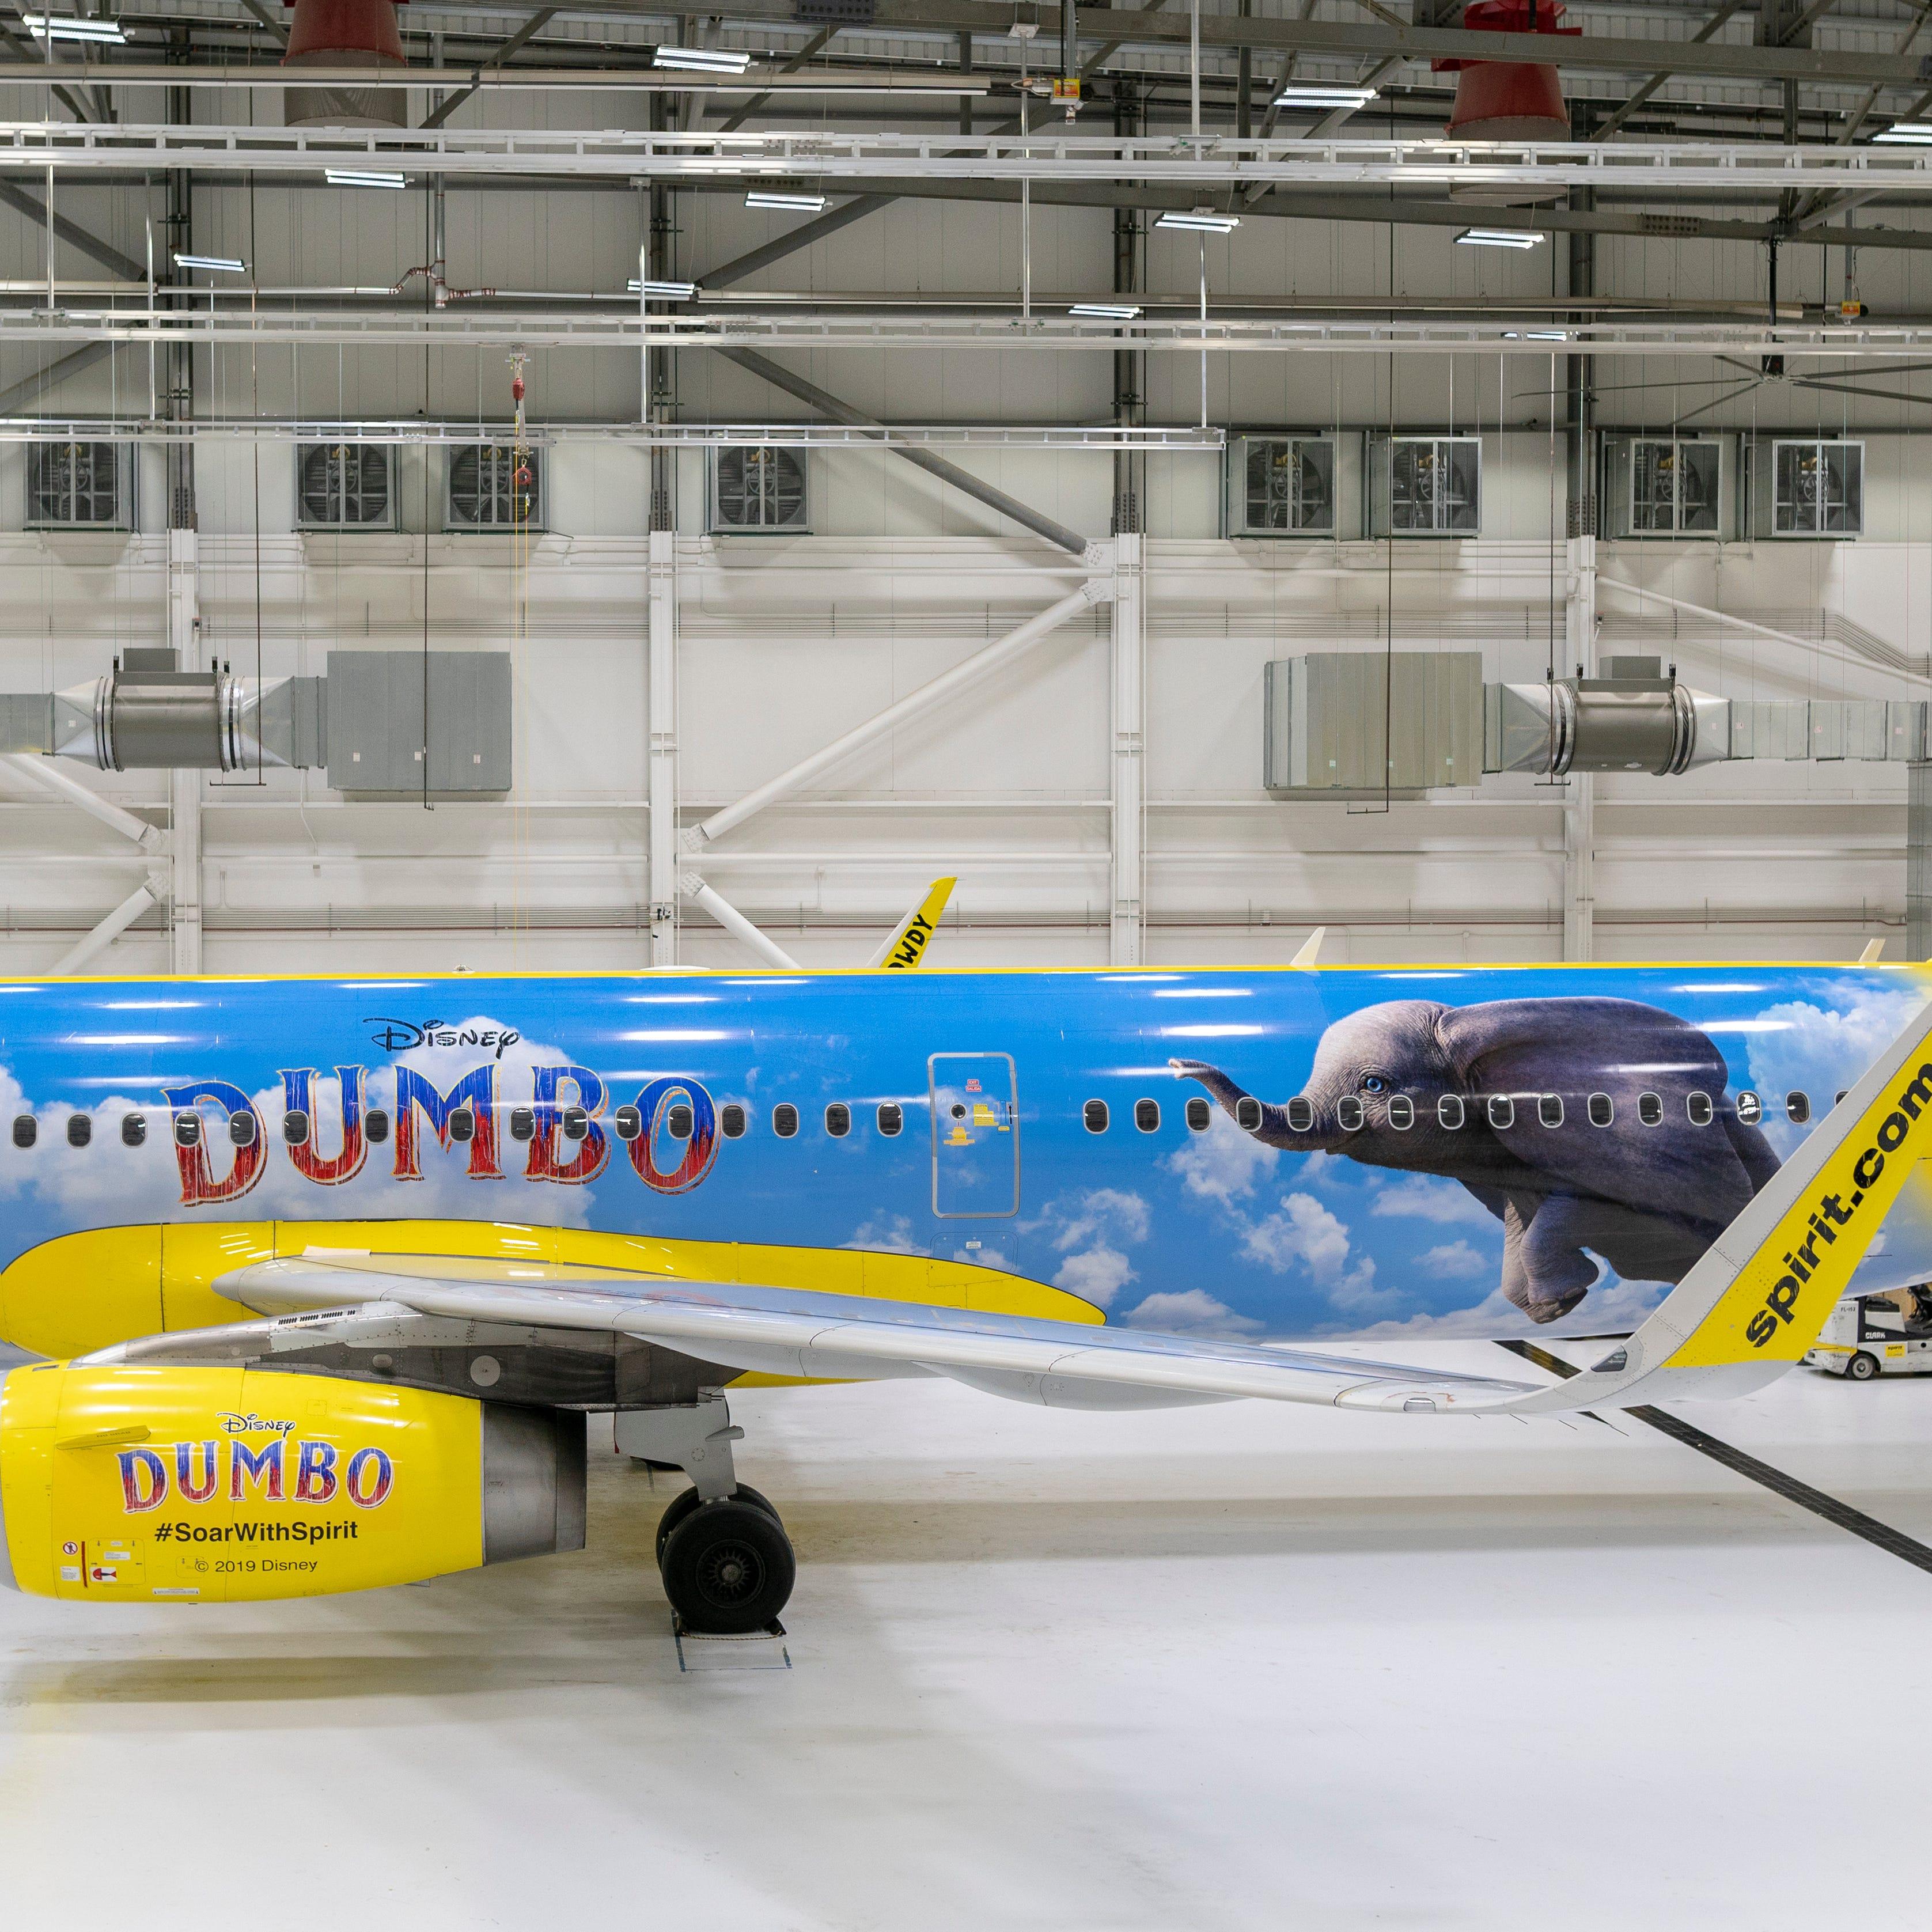 Spirit unveils new 'Dumbo' airplane at Detroit Metro Airport